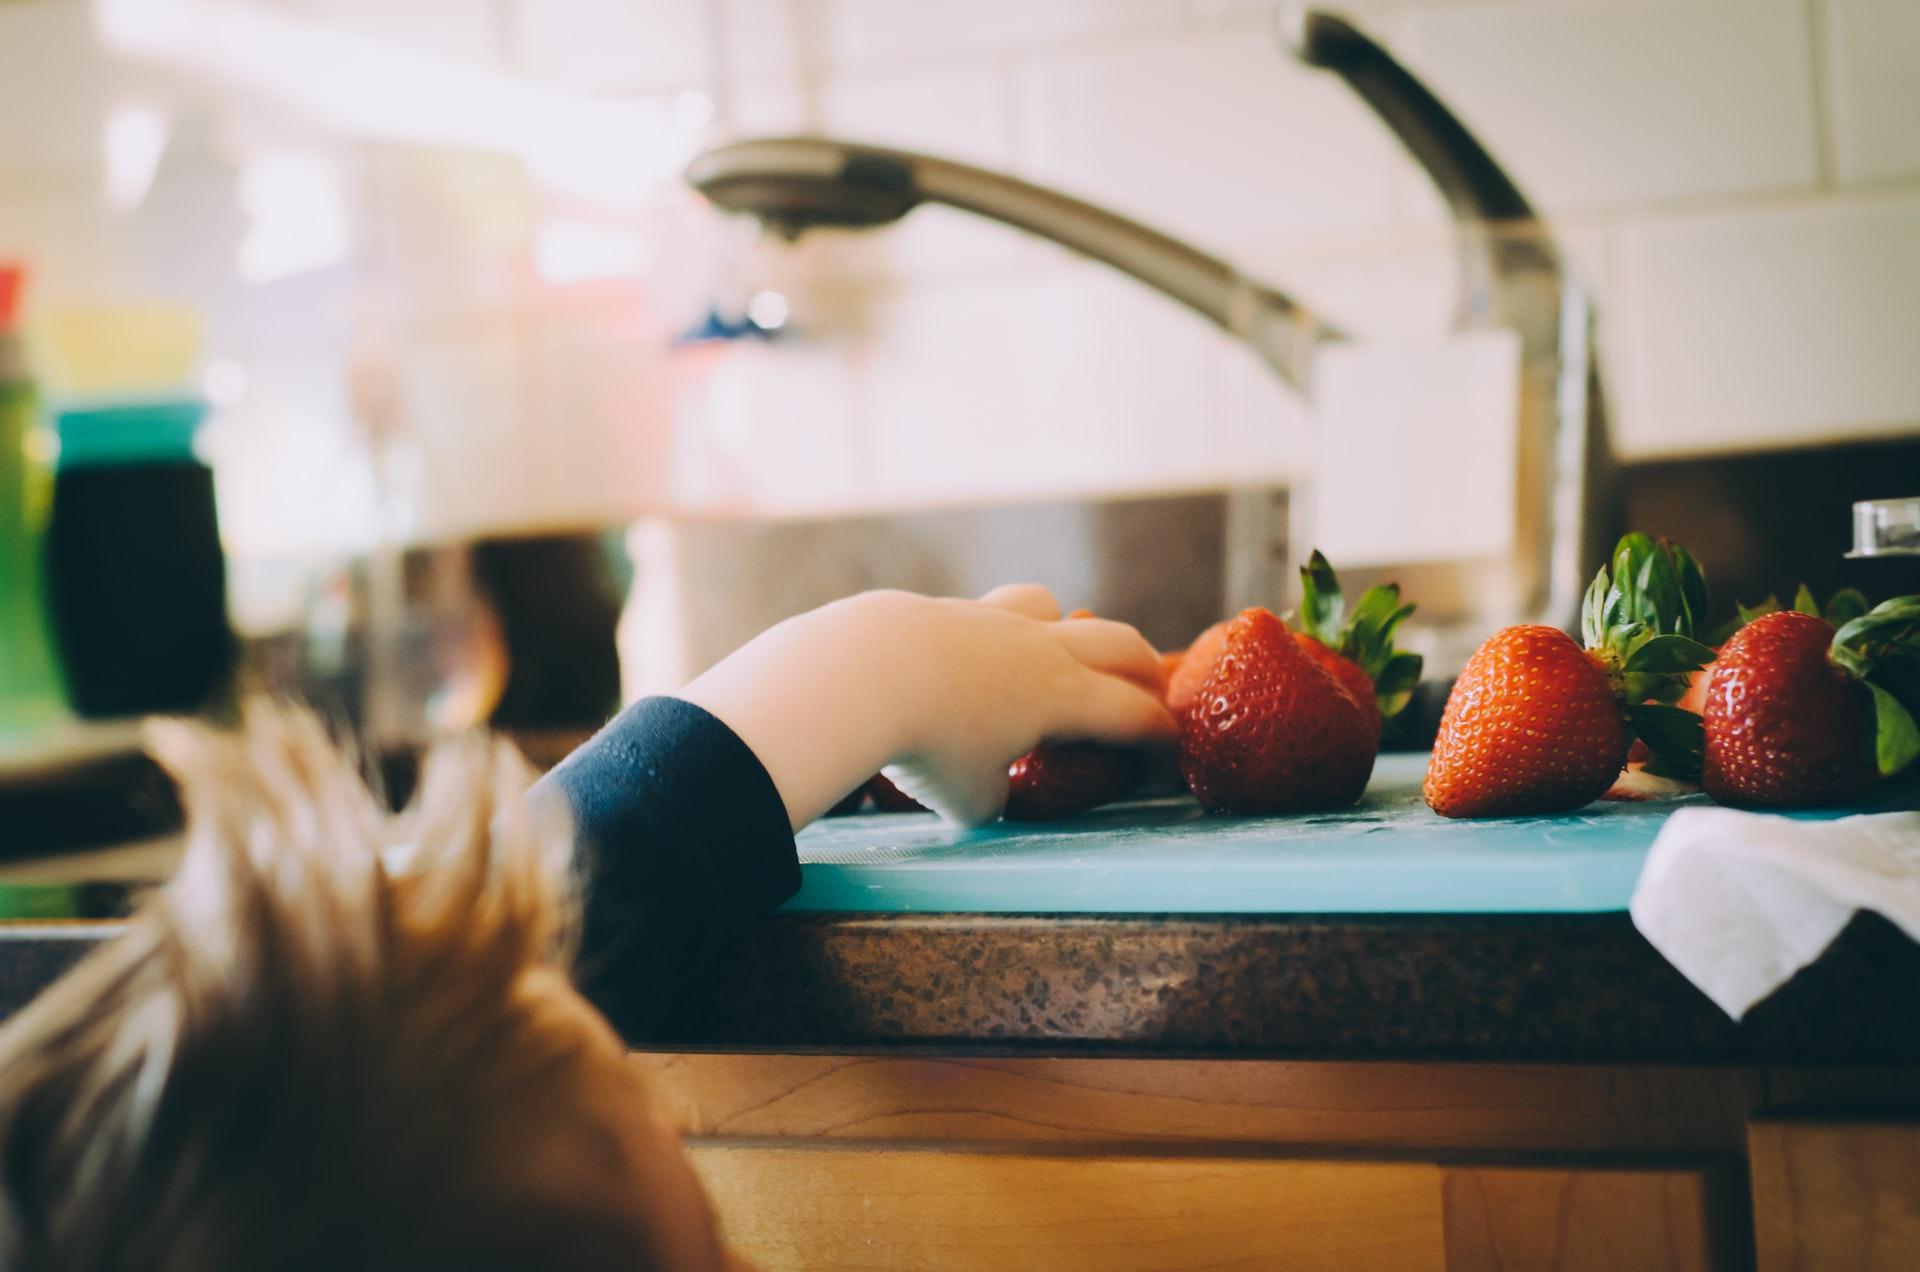 Chłopiec sięga po truskawki